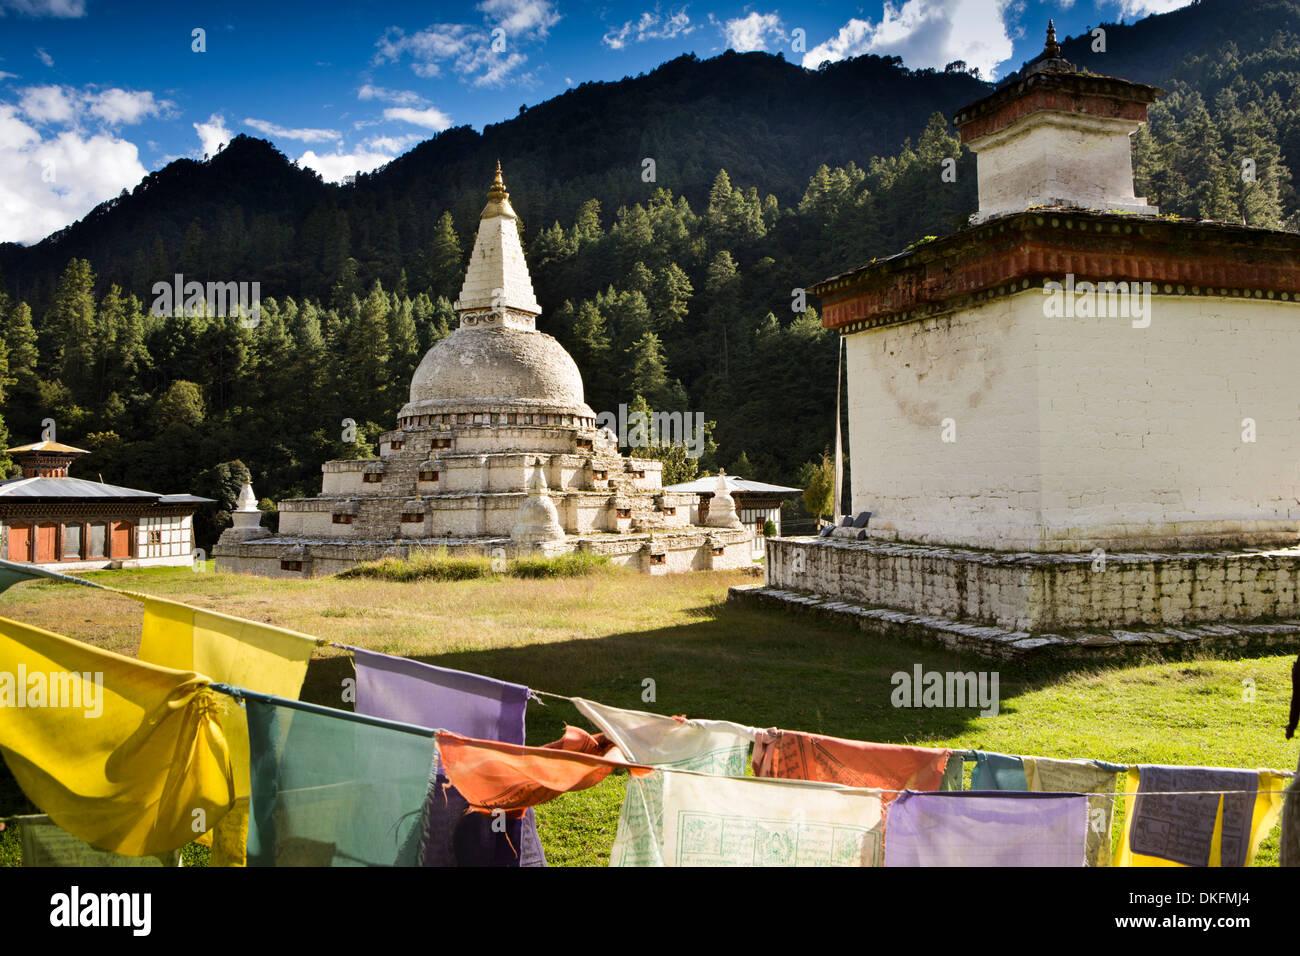 Bhutan, Pele La Pass, Chendebji Buddhist Chorten beside Trongsa to Pele La road - Stock Image